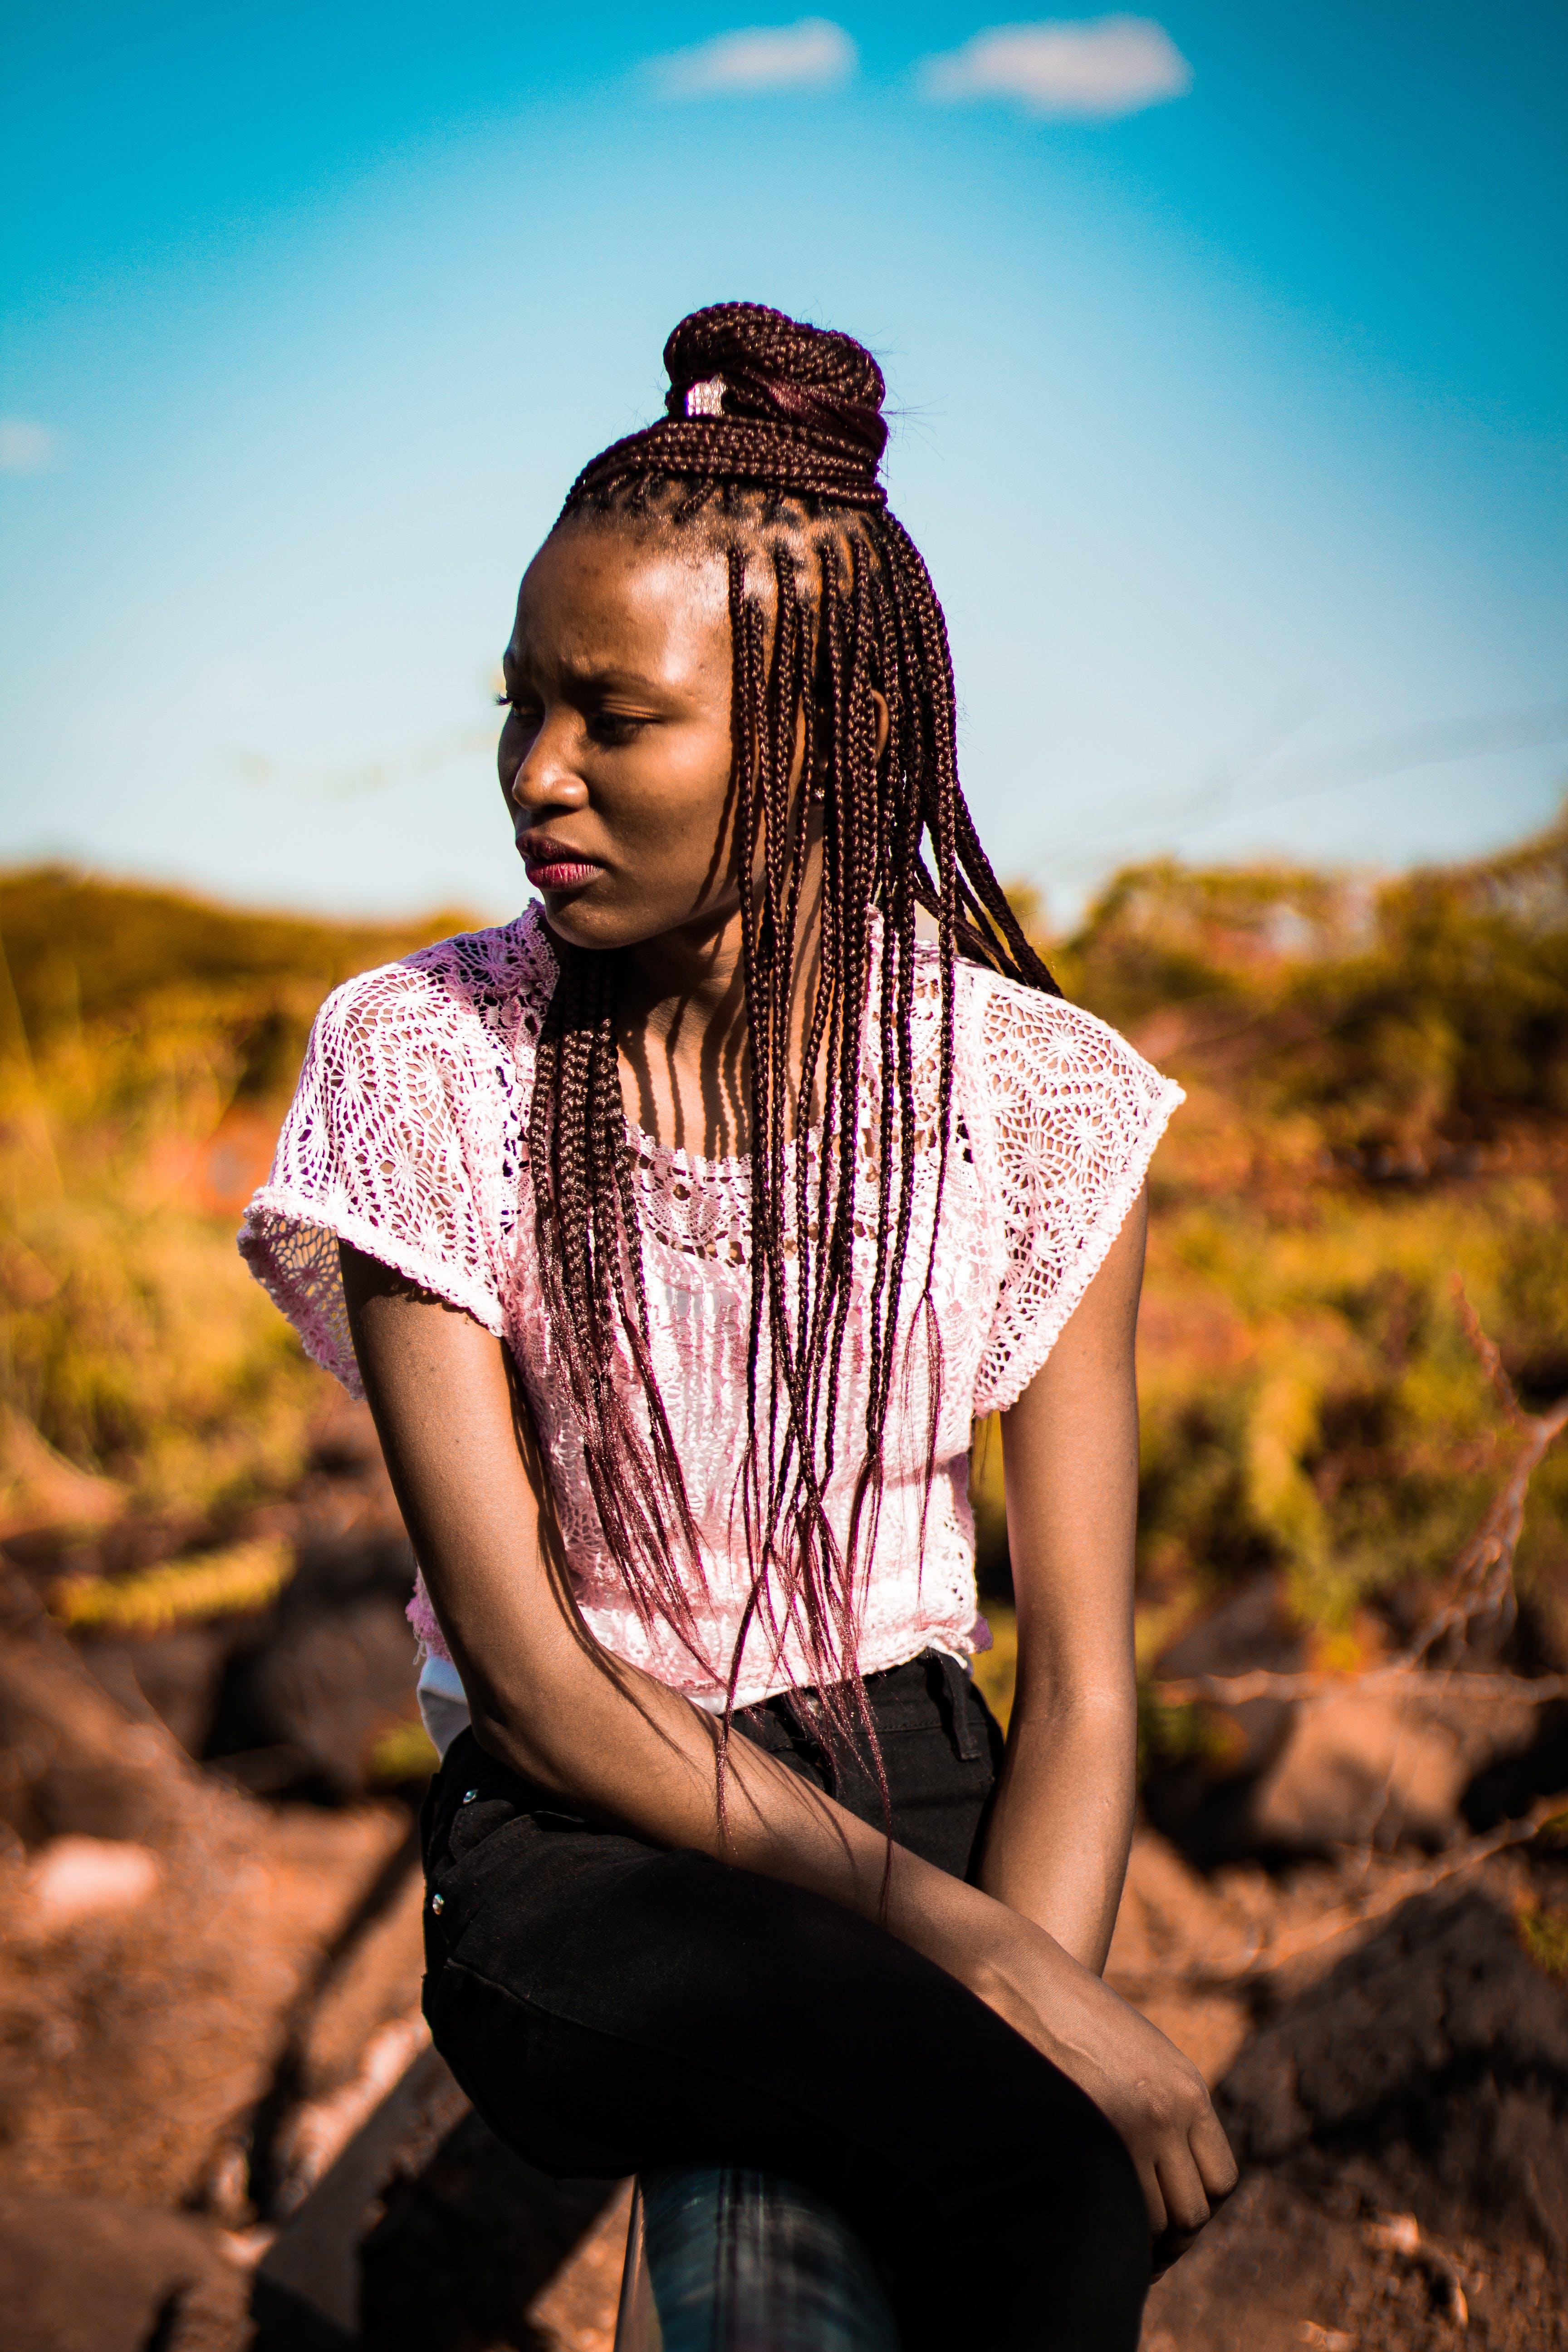 afrikansk, fotosession, kjole